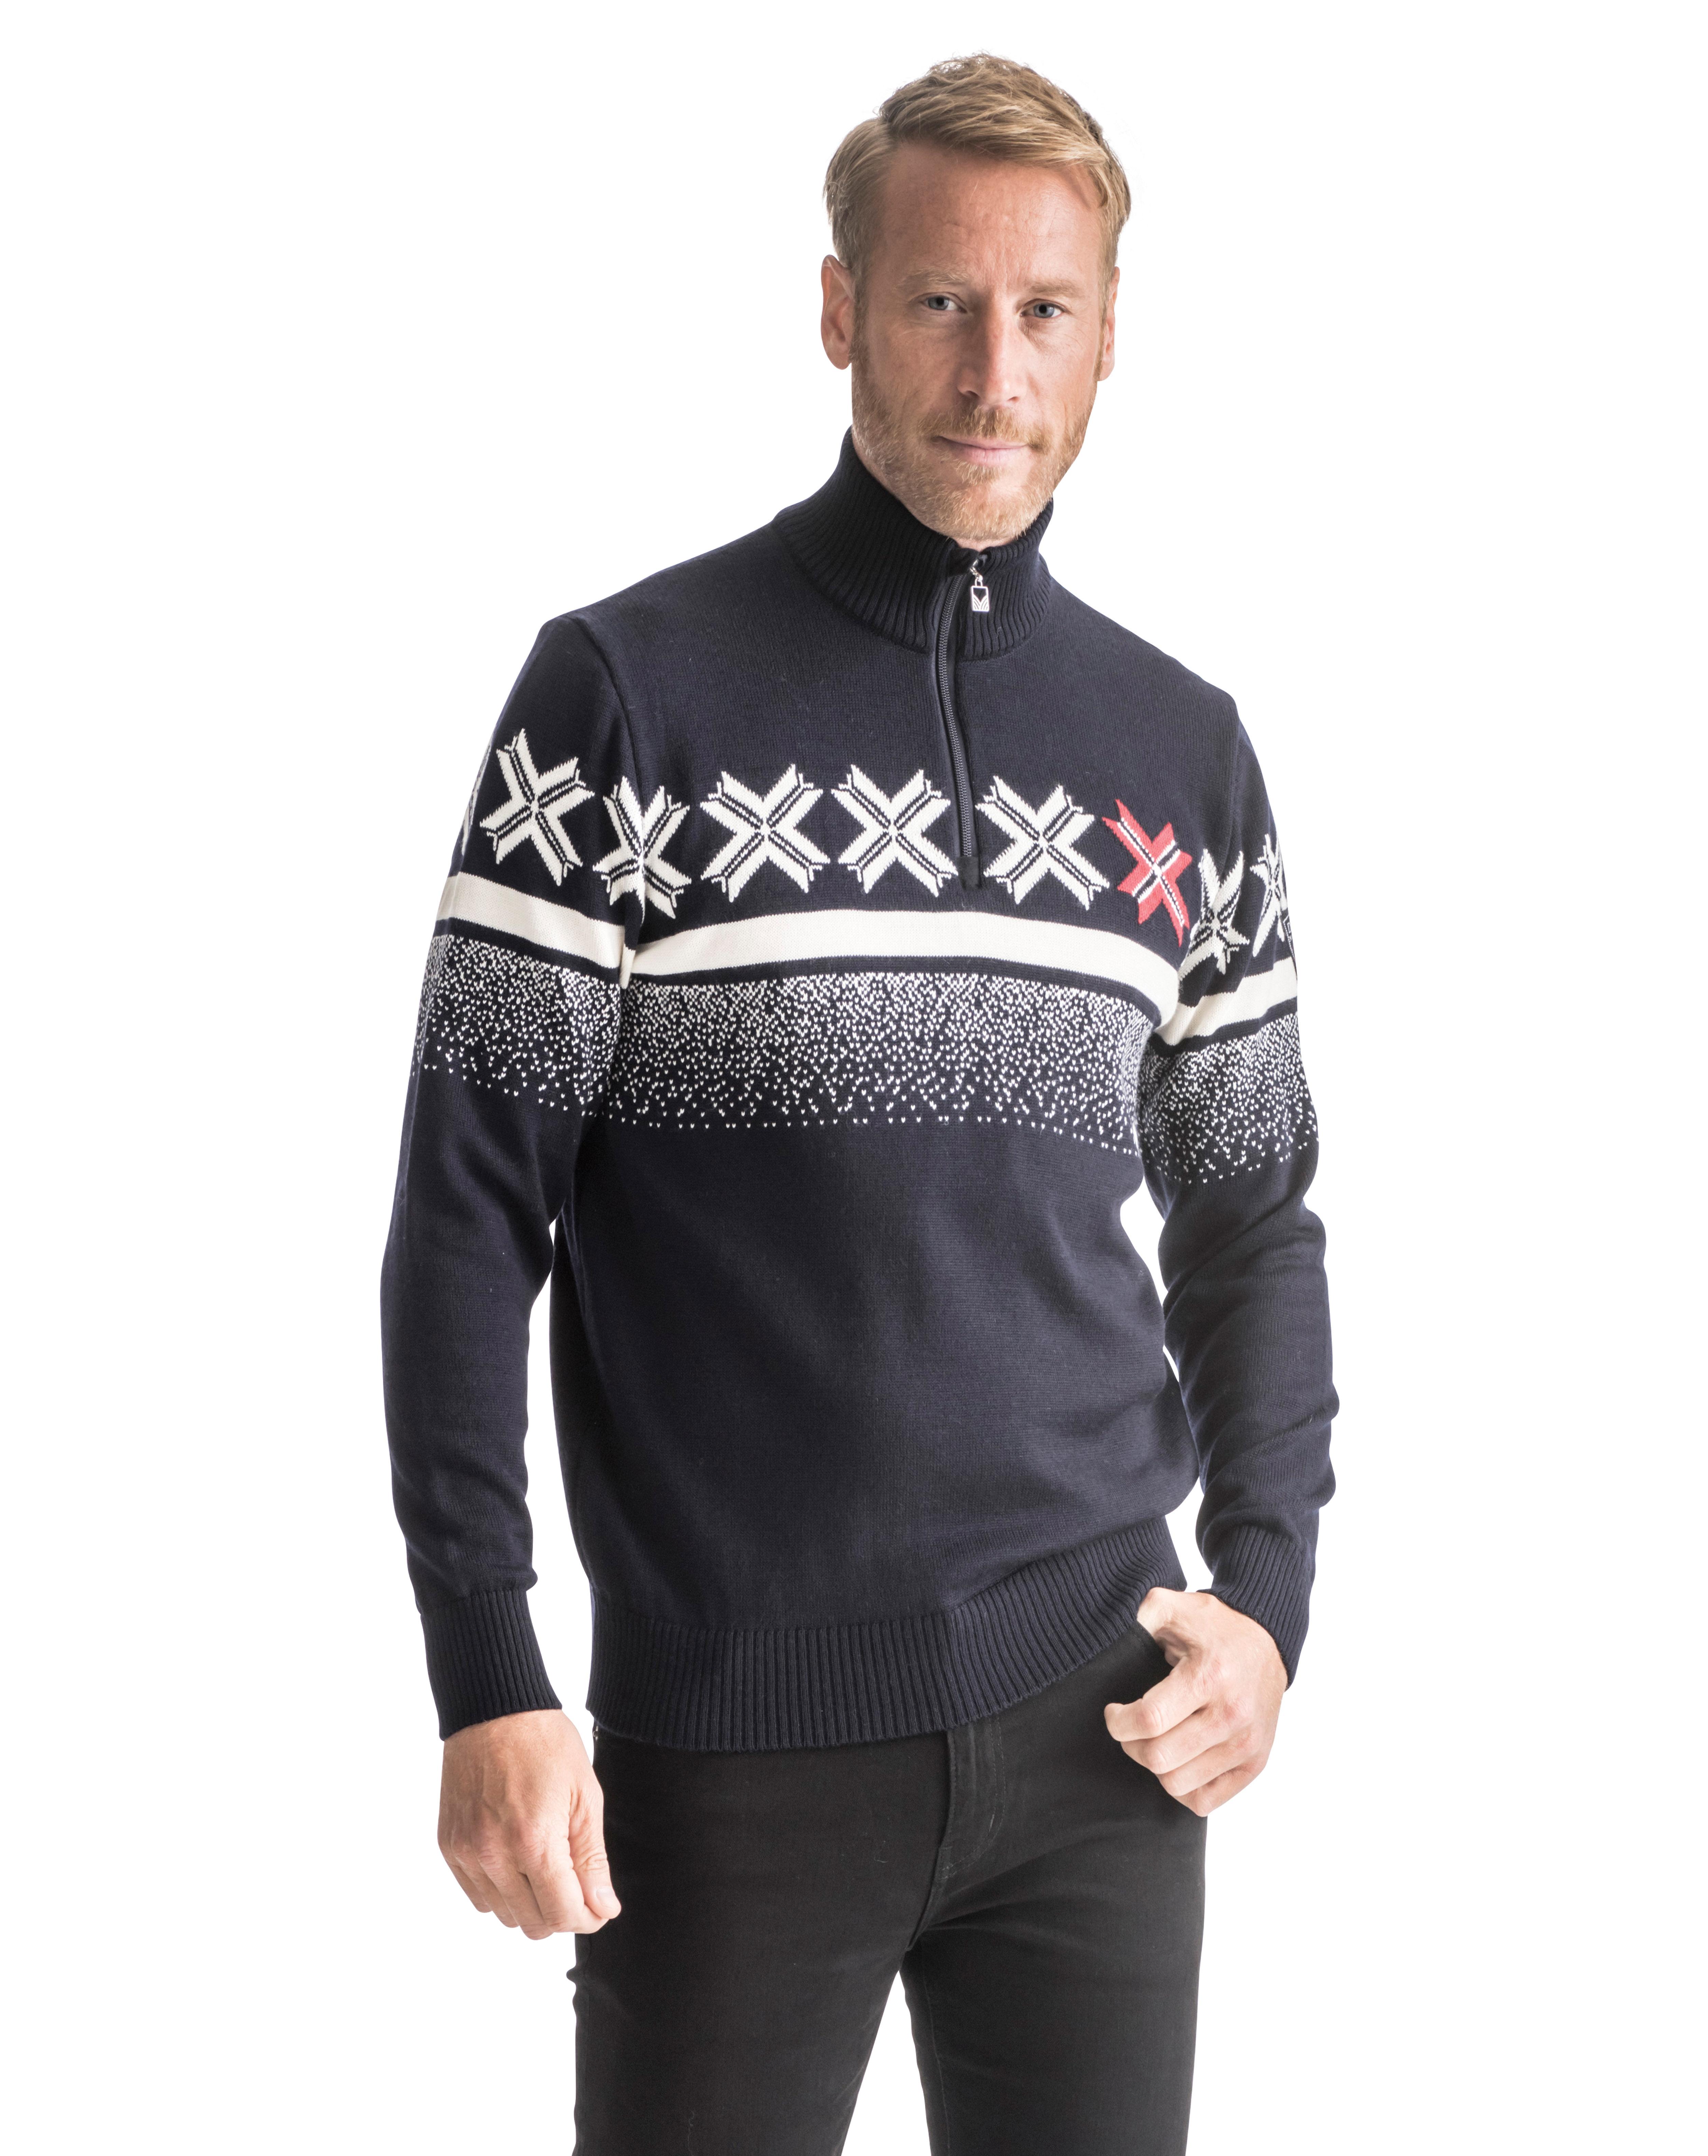 OL Passion Masculine Sweater